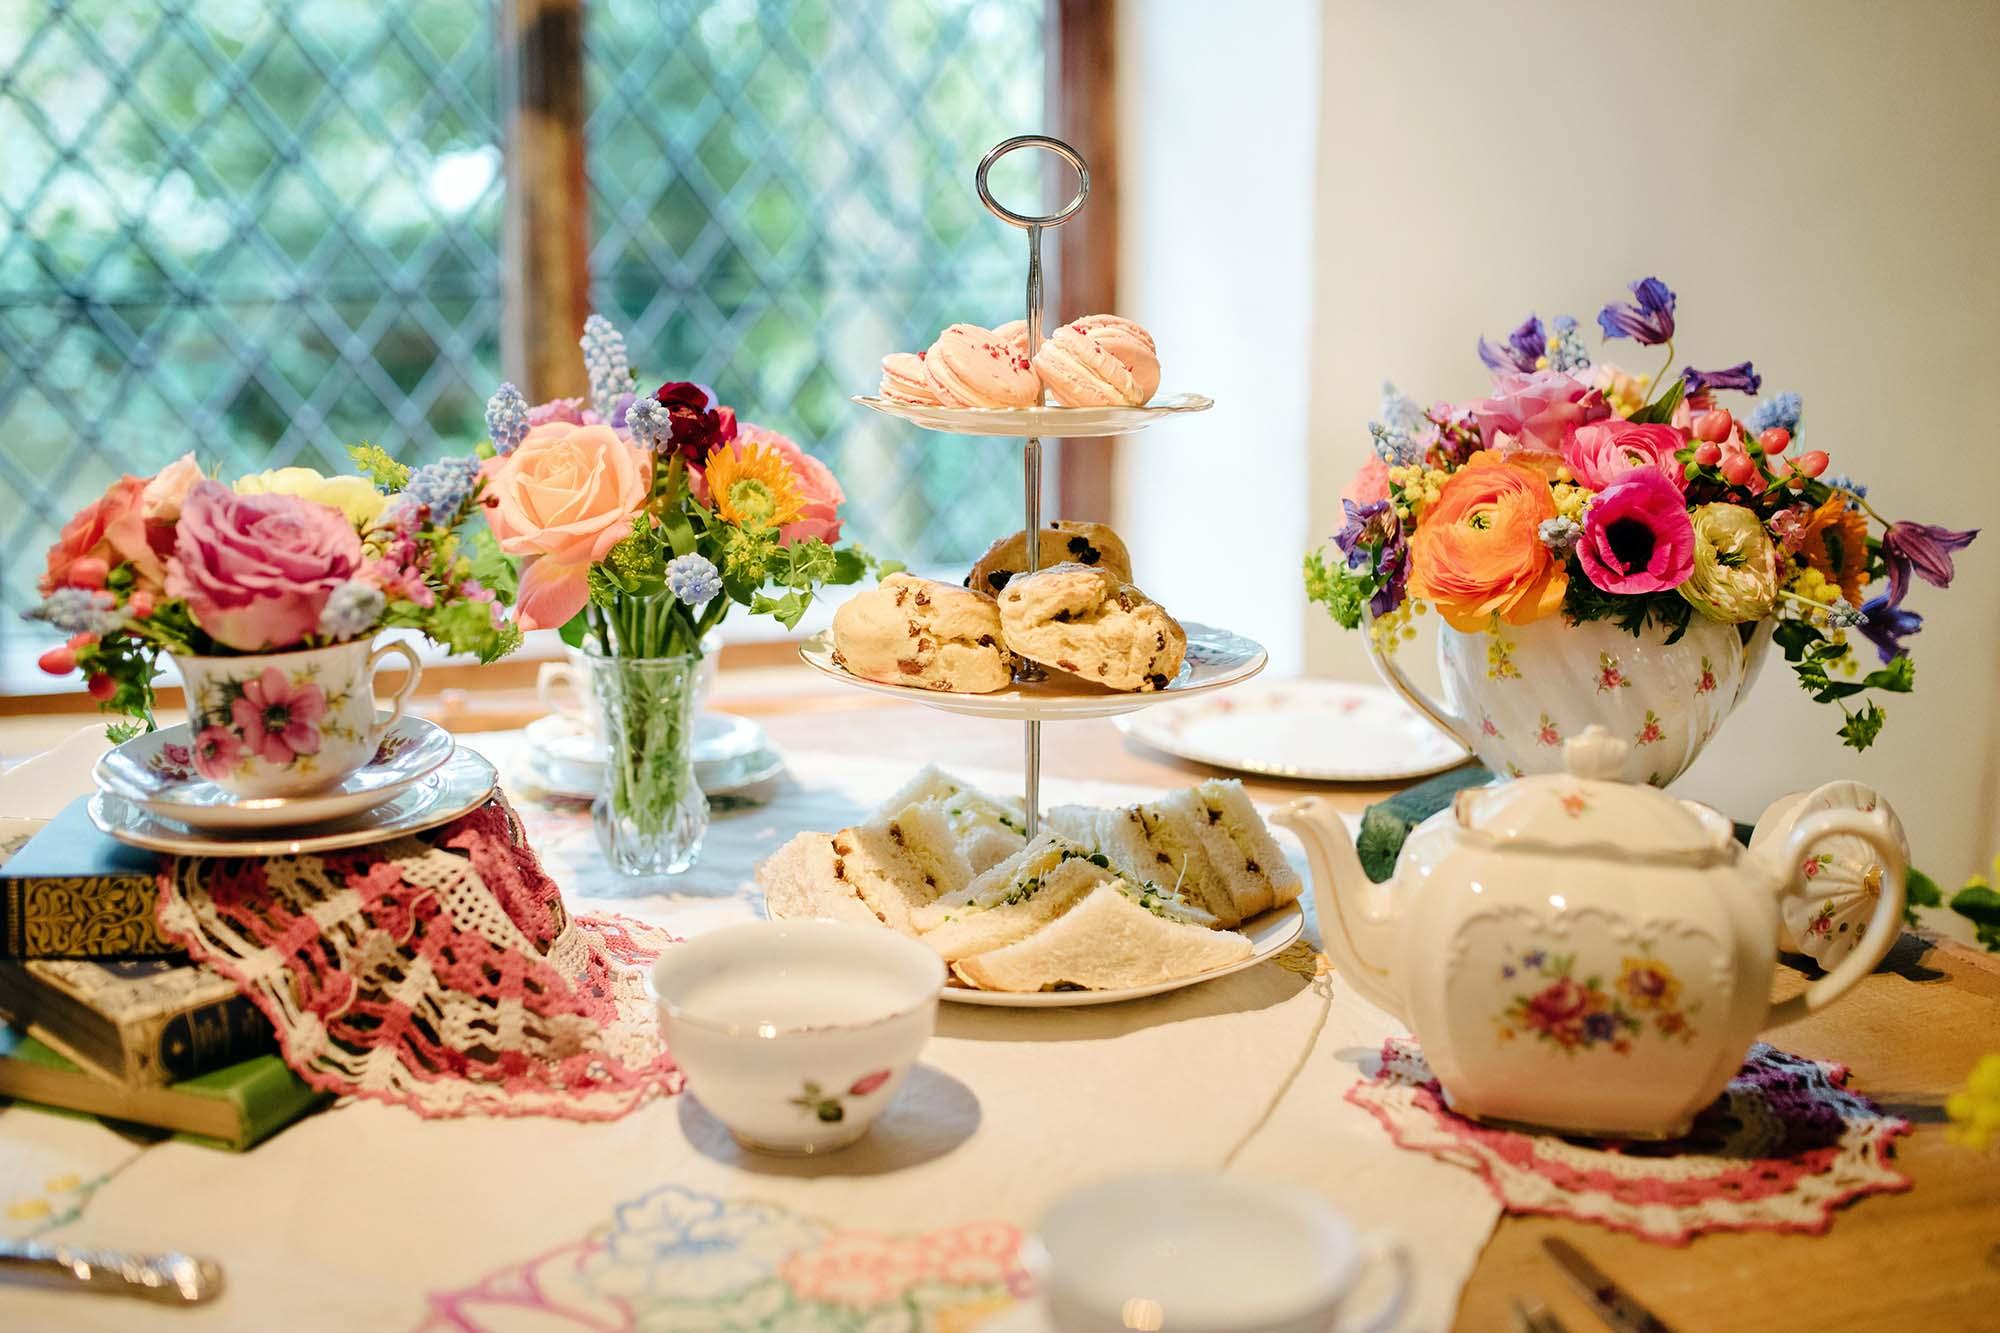 Vintage Tea Party Inspiration Shoot at the Pilgrims Rest, Sarah Williams Photography